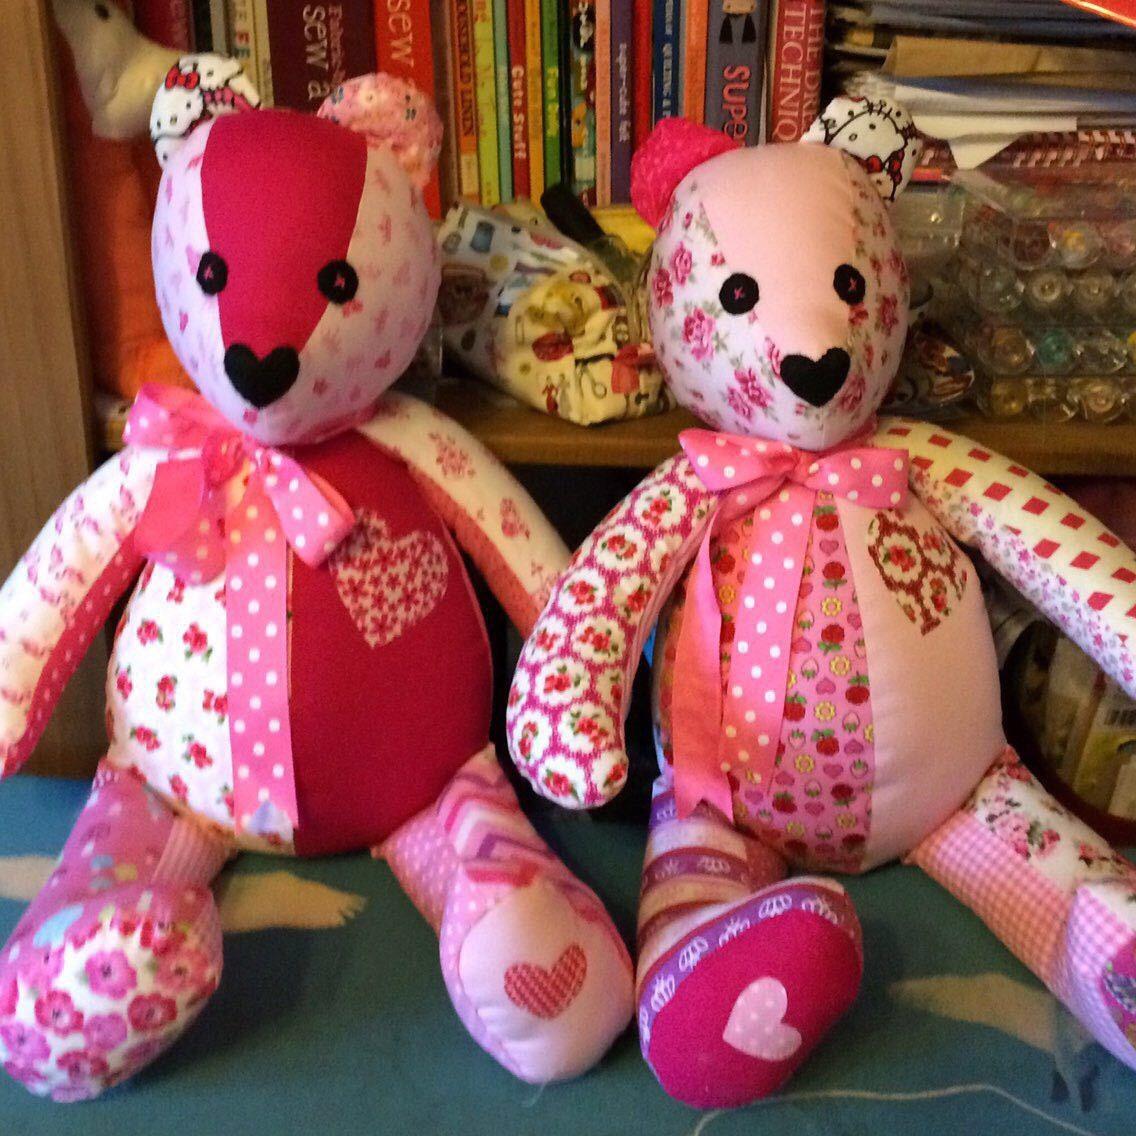 Stuffed Bear gift handmade Patchwork bear soft toy vanu shower gift childs gift idea You Choose Colour Schem Gift idea home decor.